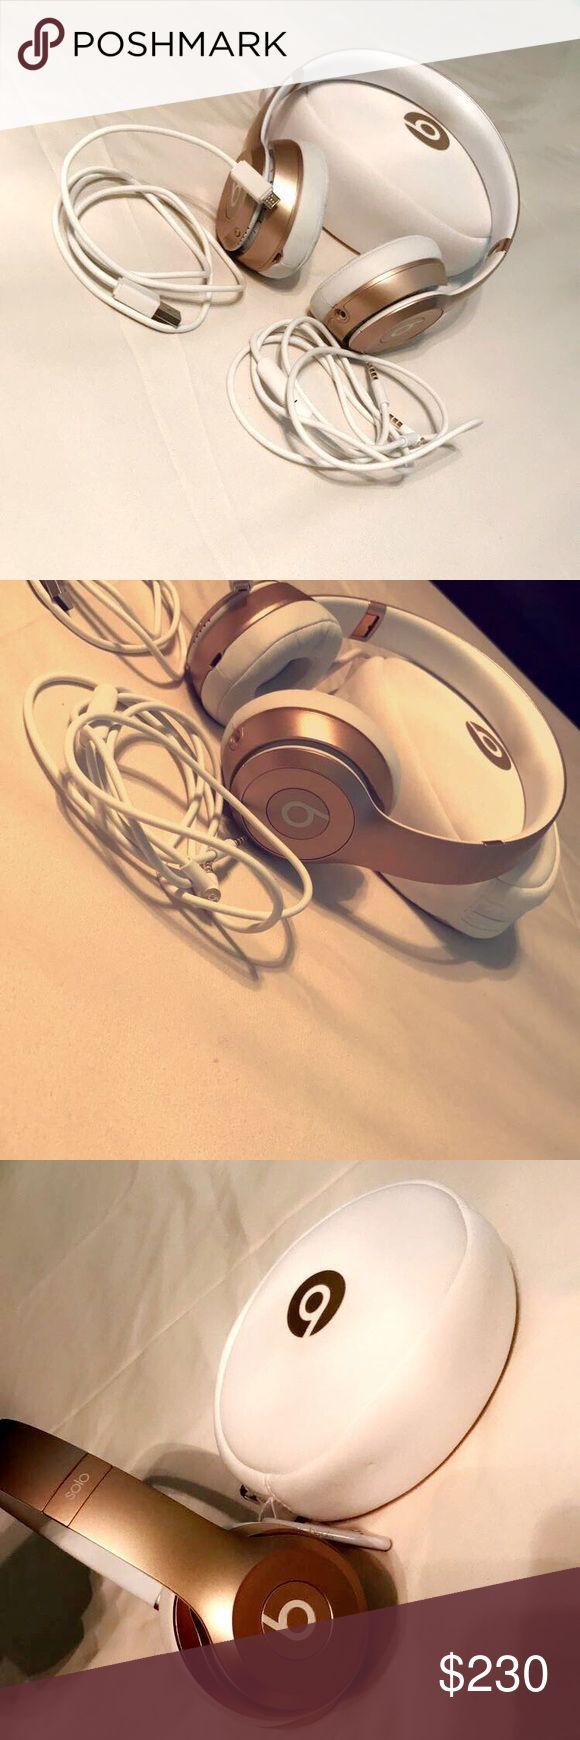 Beats by Dre Wireless Headphones - Gold Beats by Dre Headphones. Beats by Dre Other